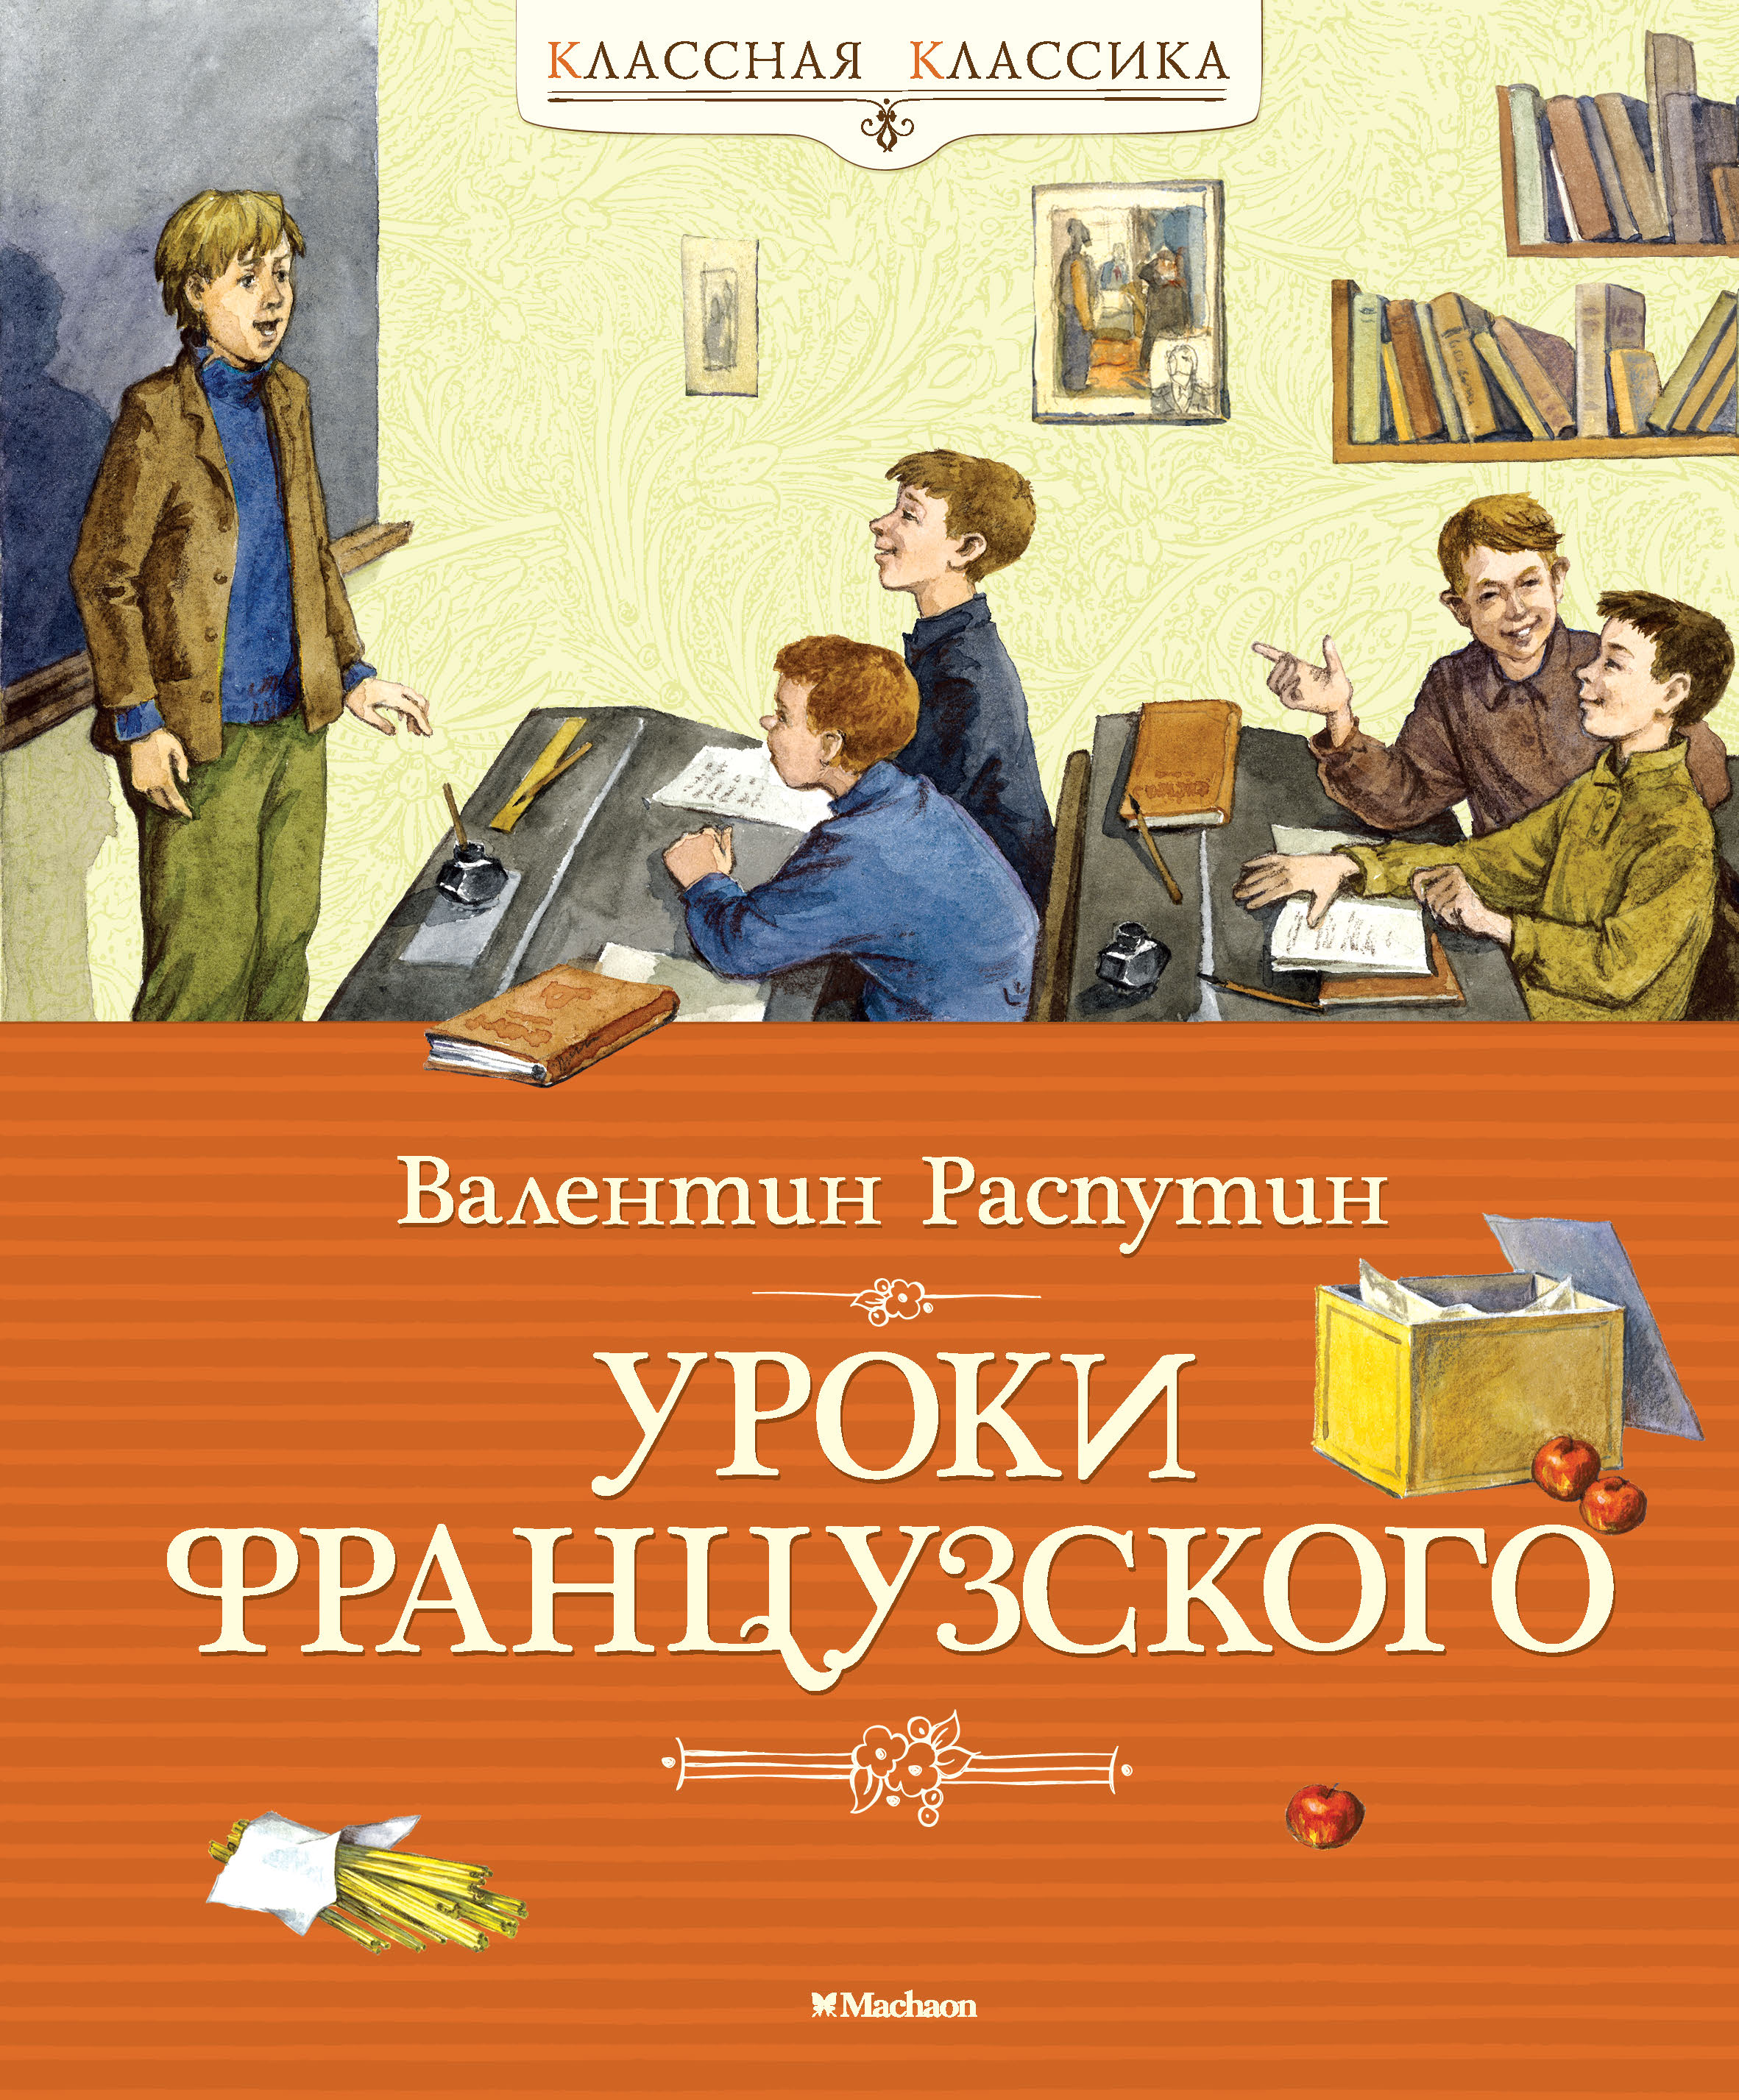 Книга распутин уроки французского